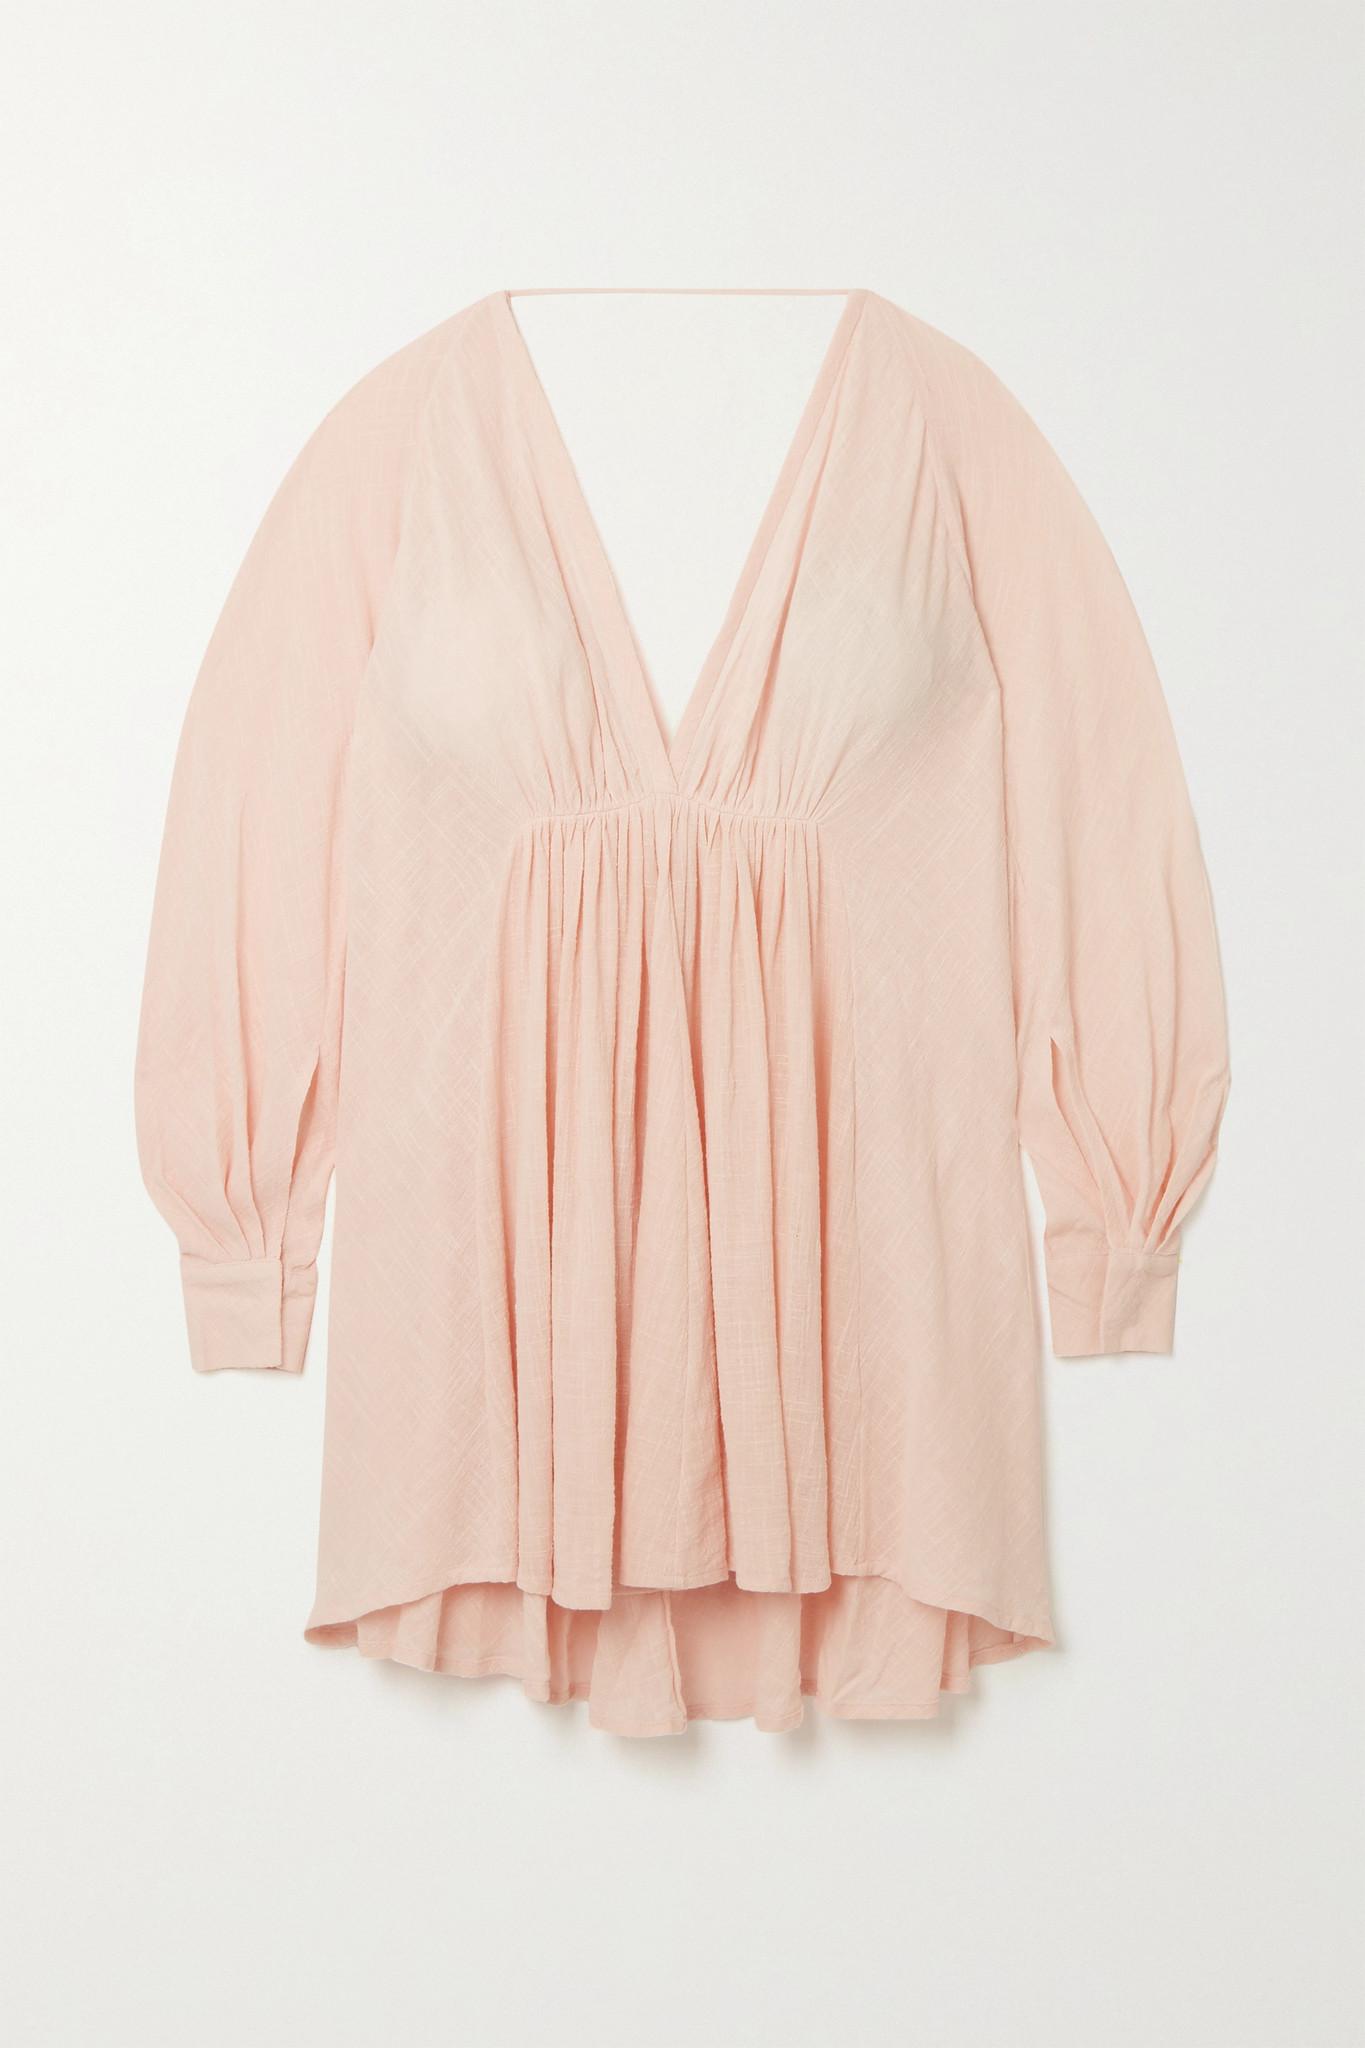 KALITA - Always The Muse Cotton-gauze Mini Dress - Pink - M/L